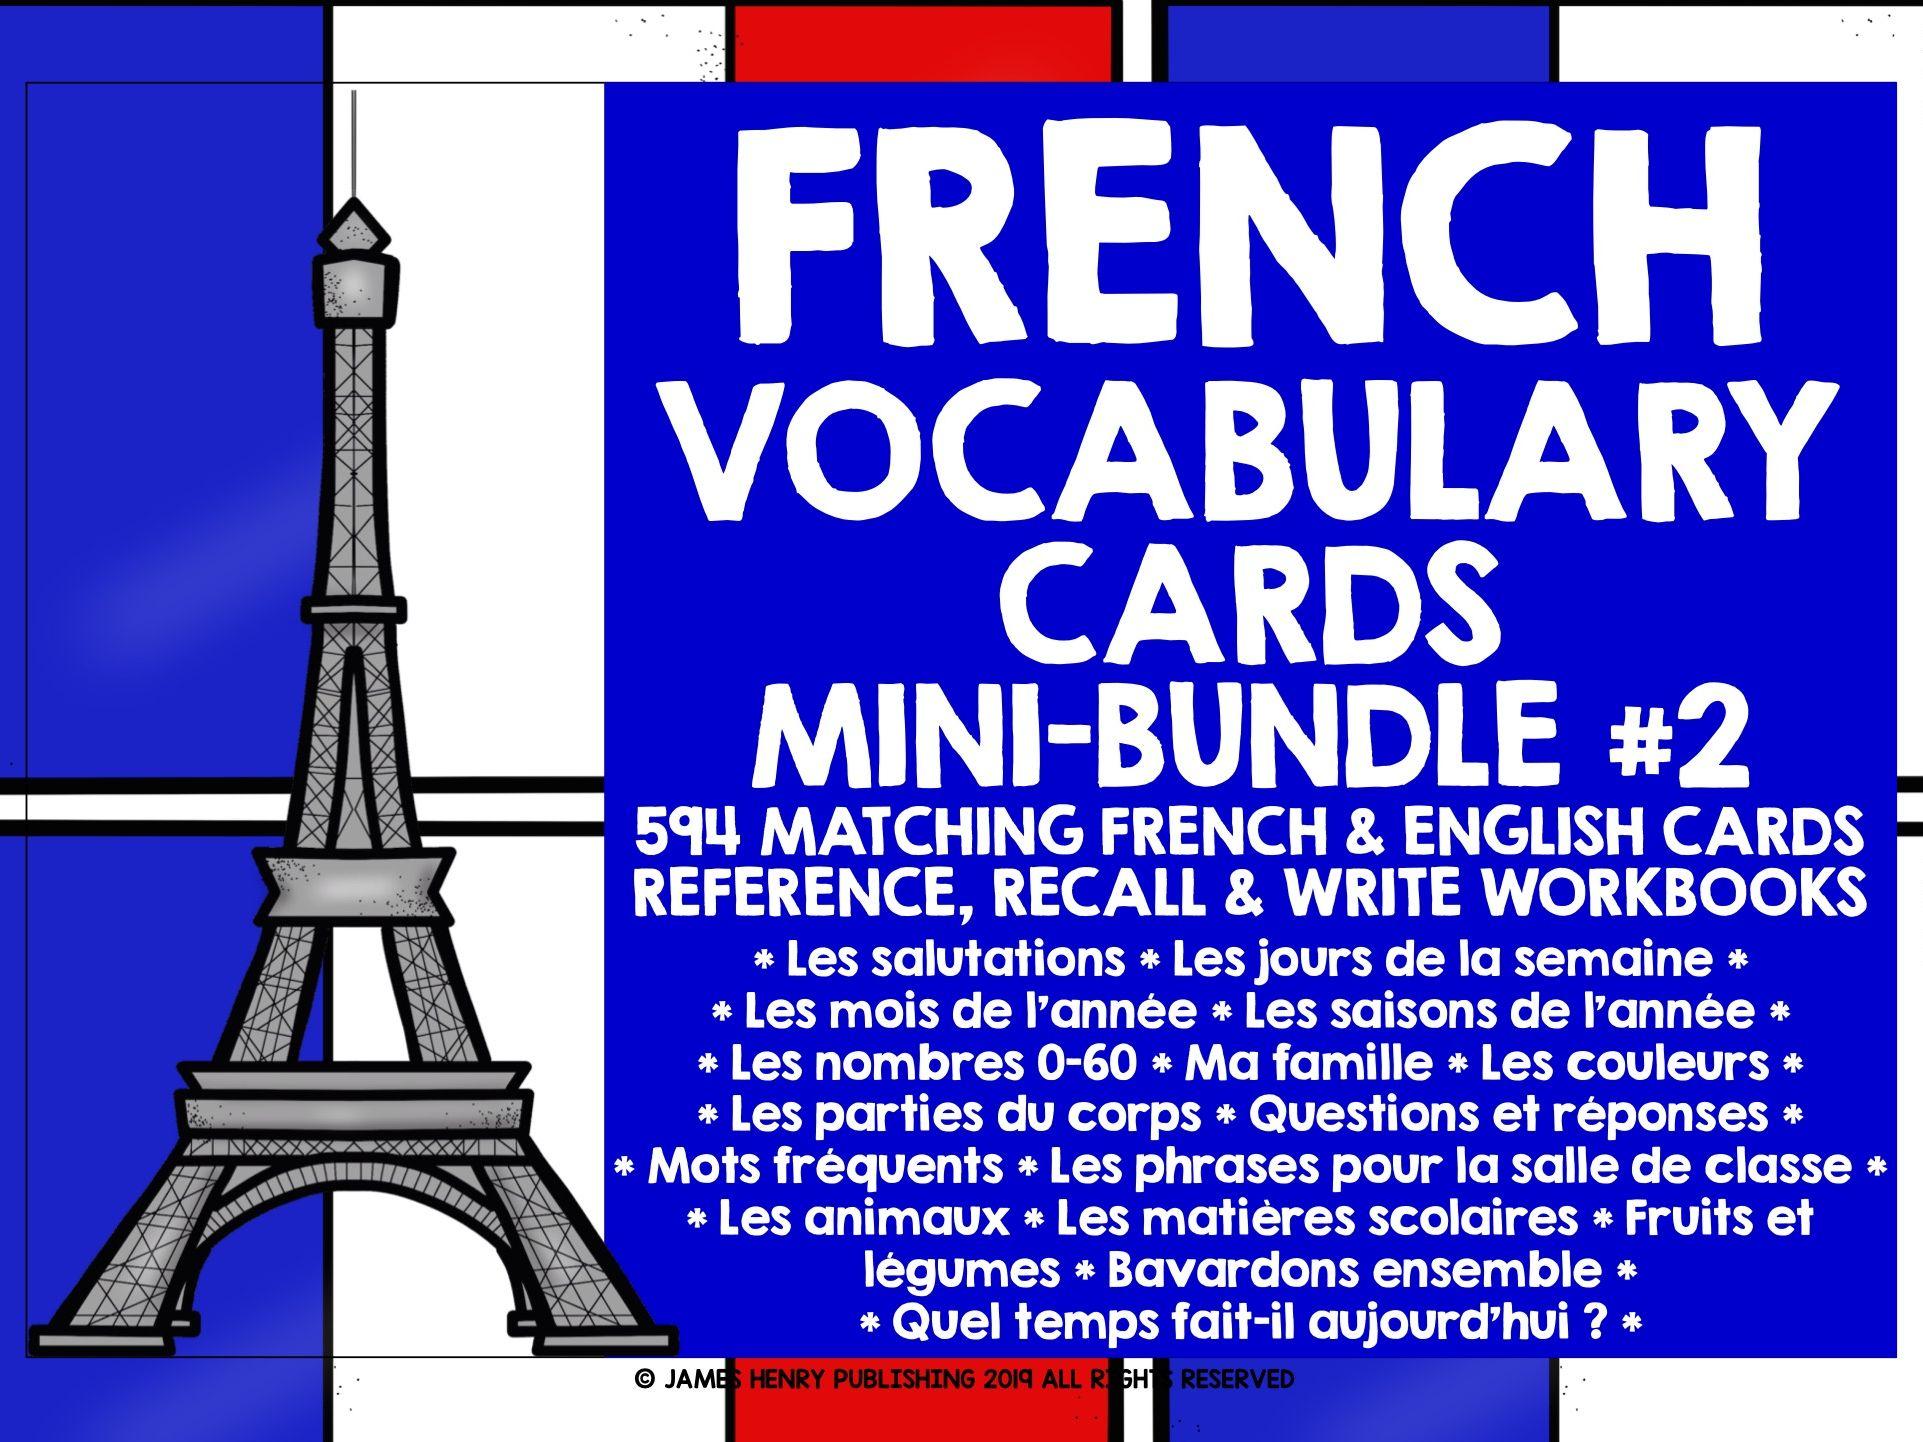 FRENCH VOCABULARY CARDS MINI-BUNDLE 2